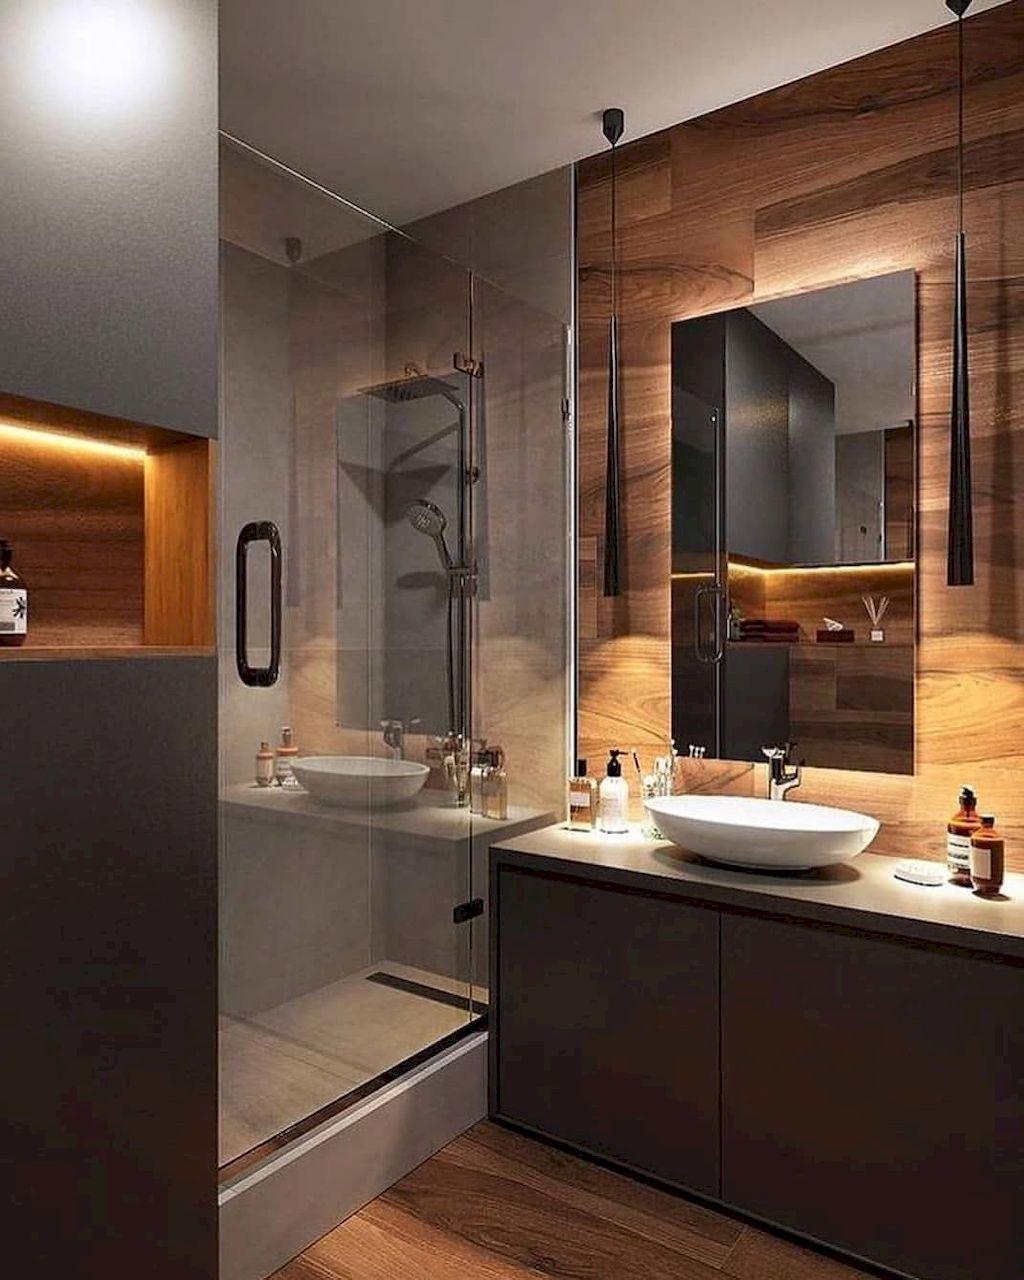 Lavatory Renovation A Step By Step Information In 2020 Badezimmer Design Badezimmer Modernes Badezimmerdesign